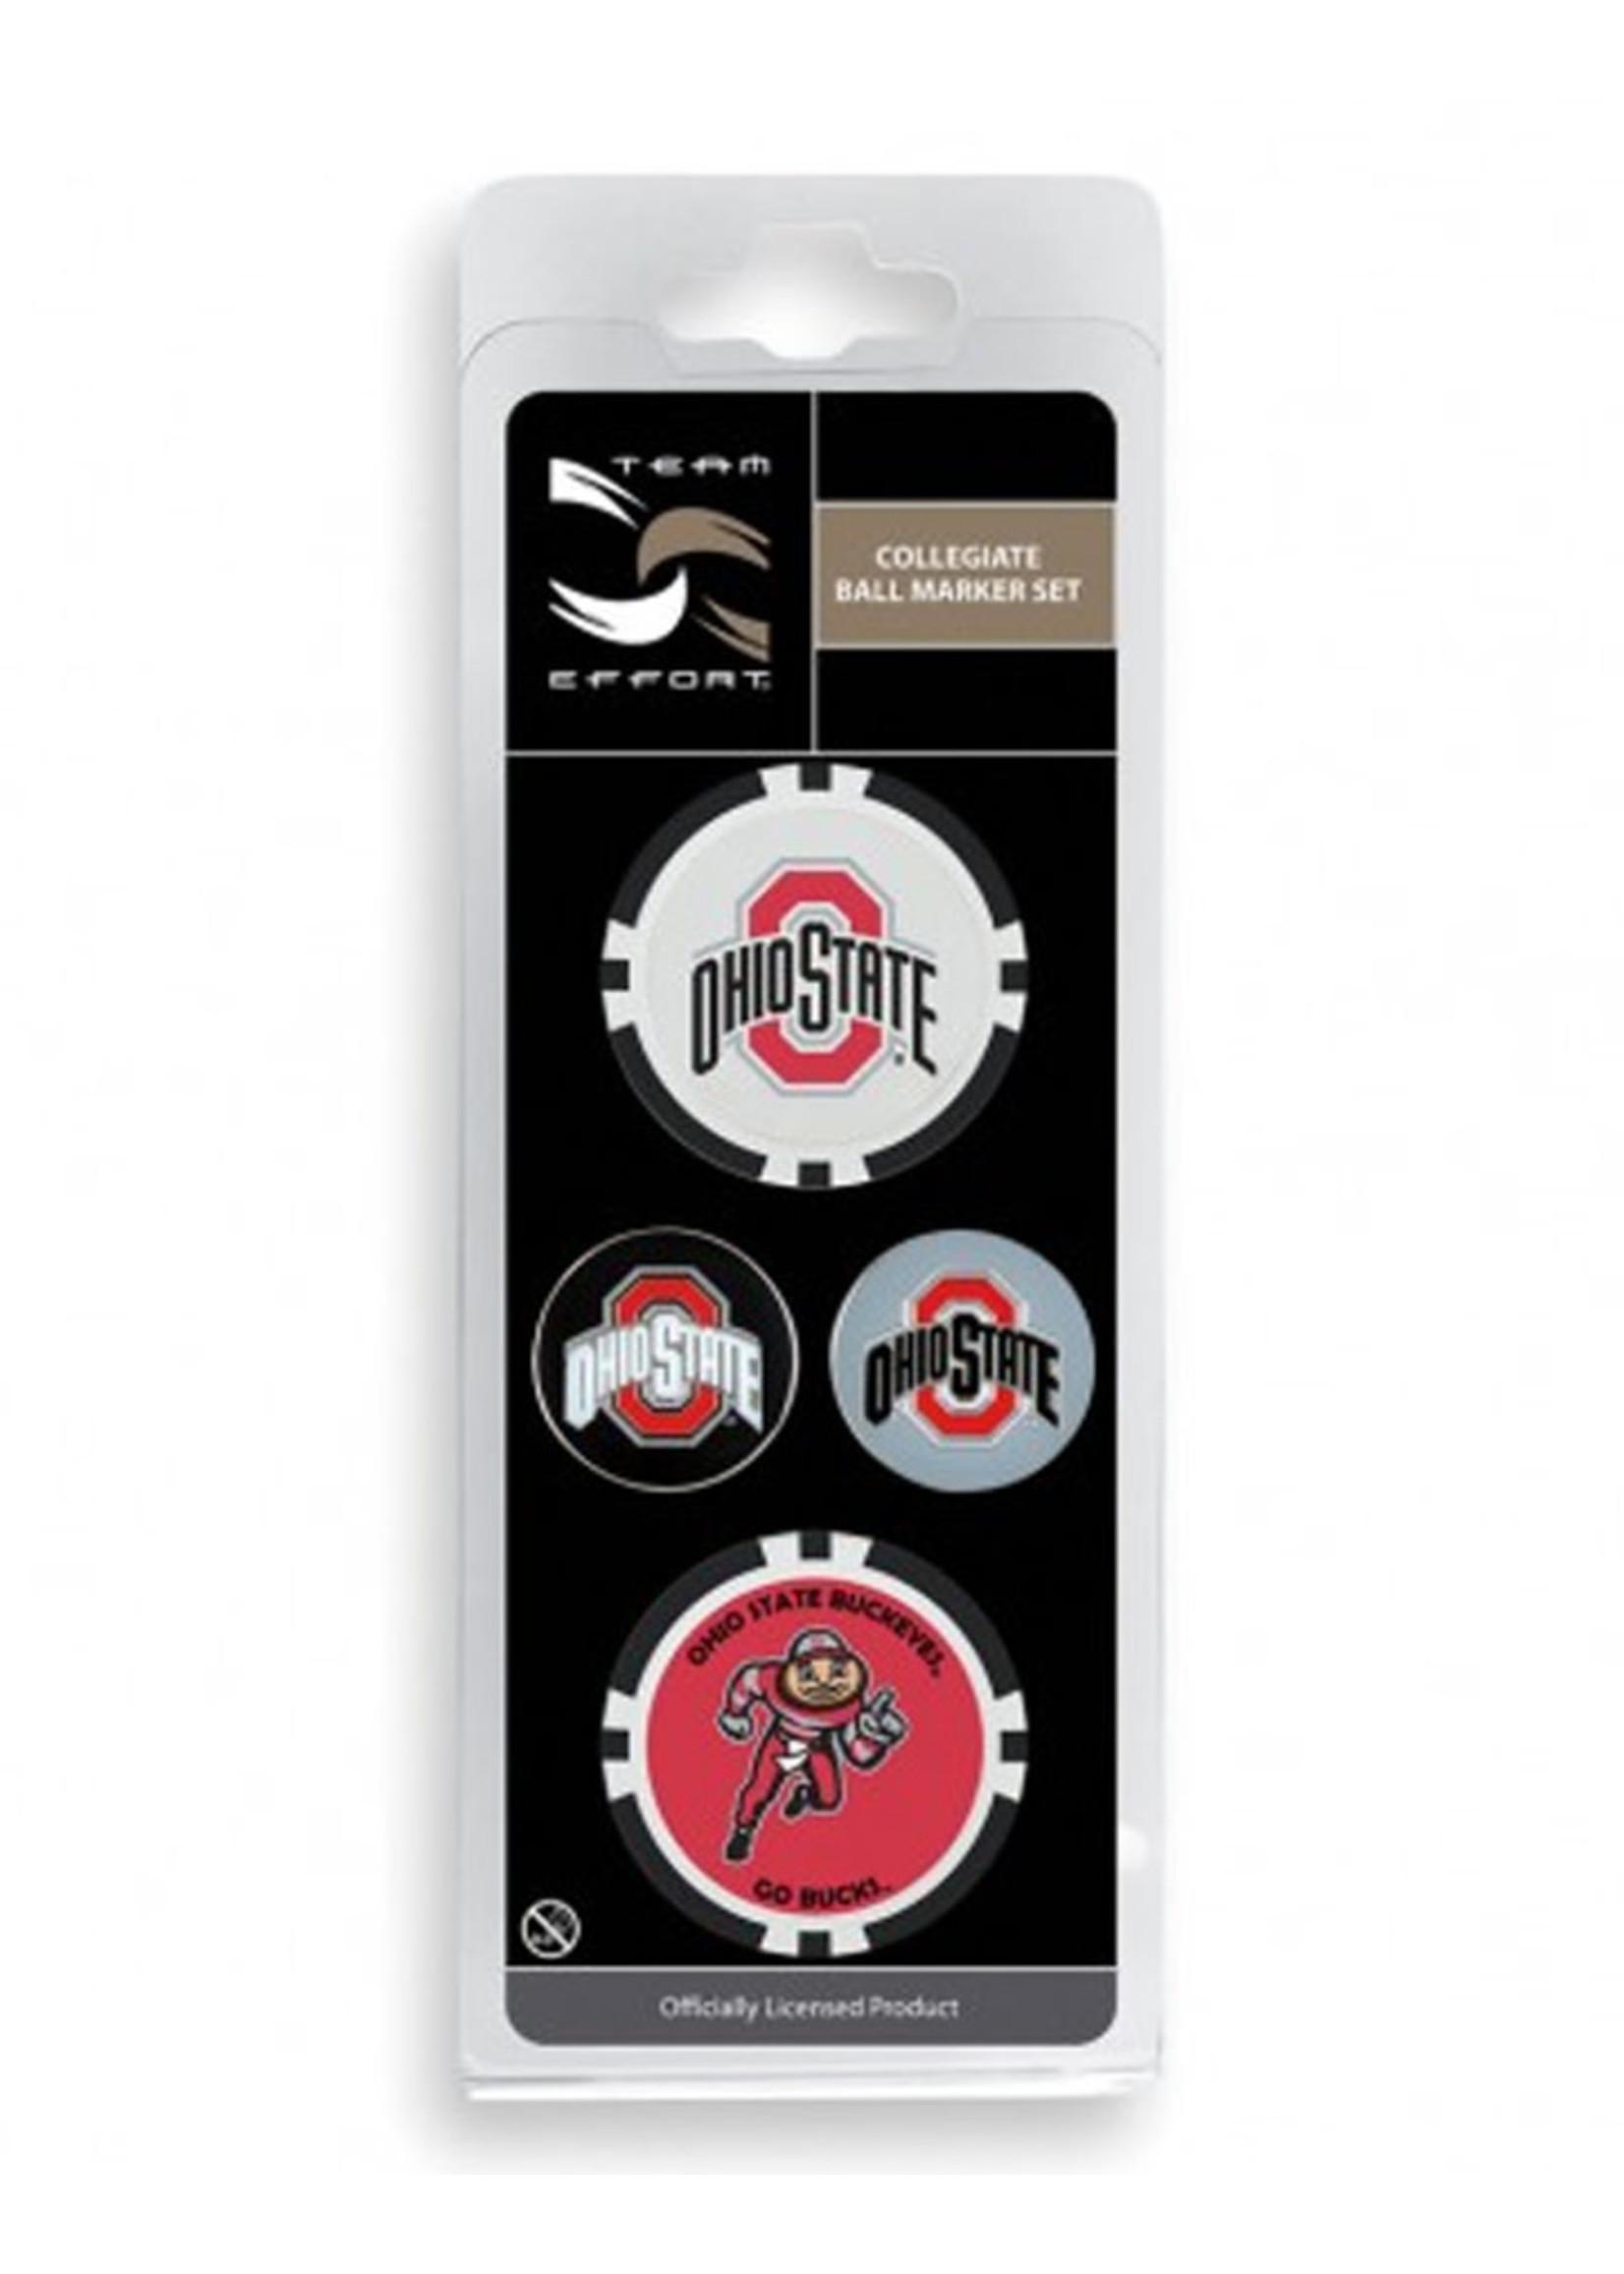 Ohio State University Ball Marker 4 Pack